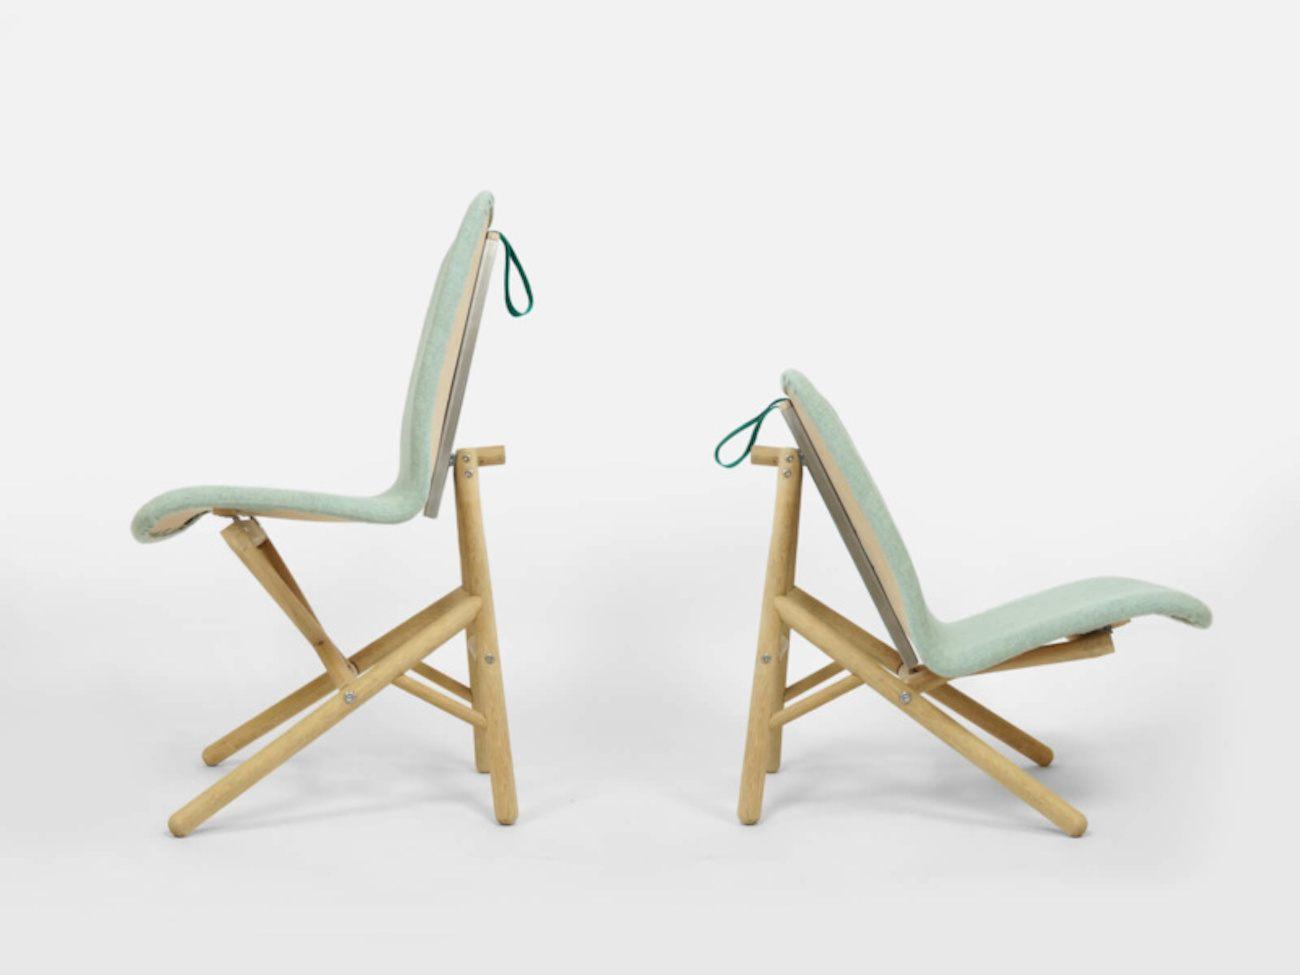 Hybrid+Chair+By+Studio+Lorier